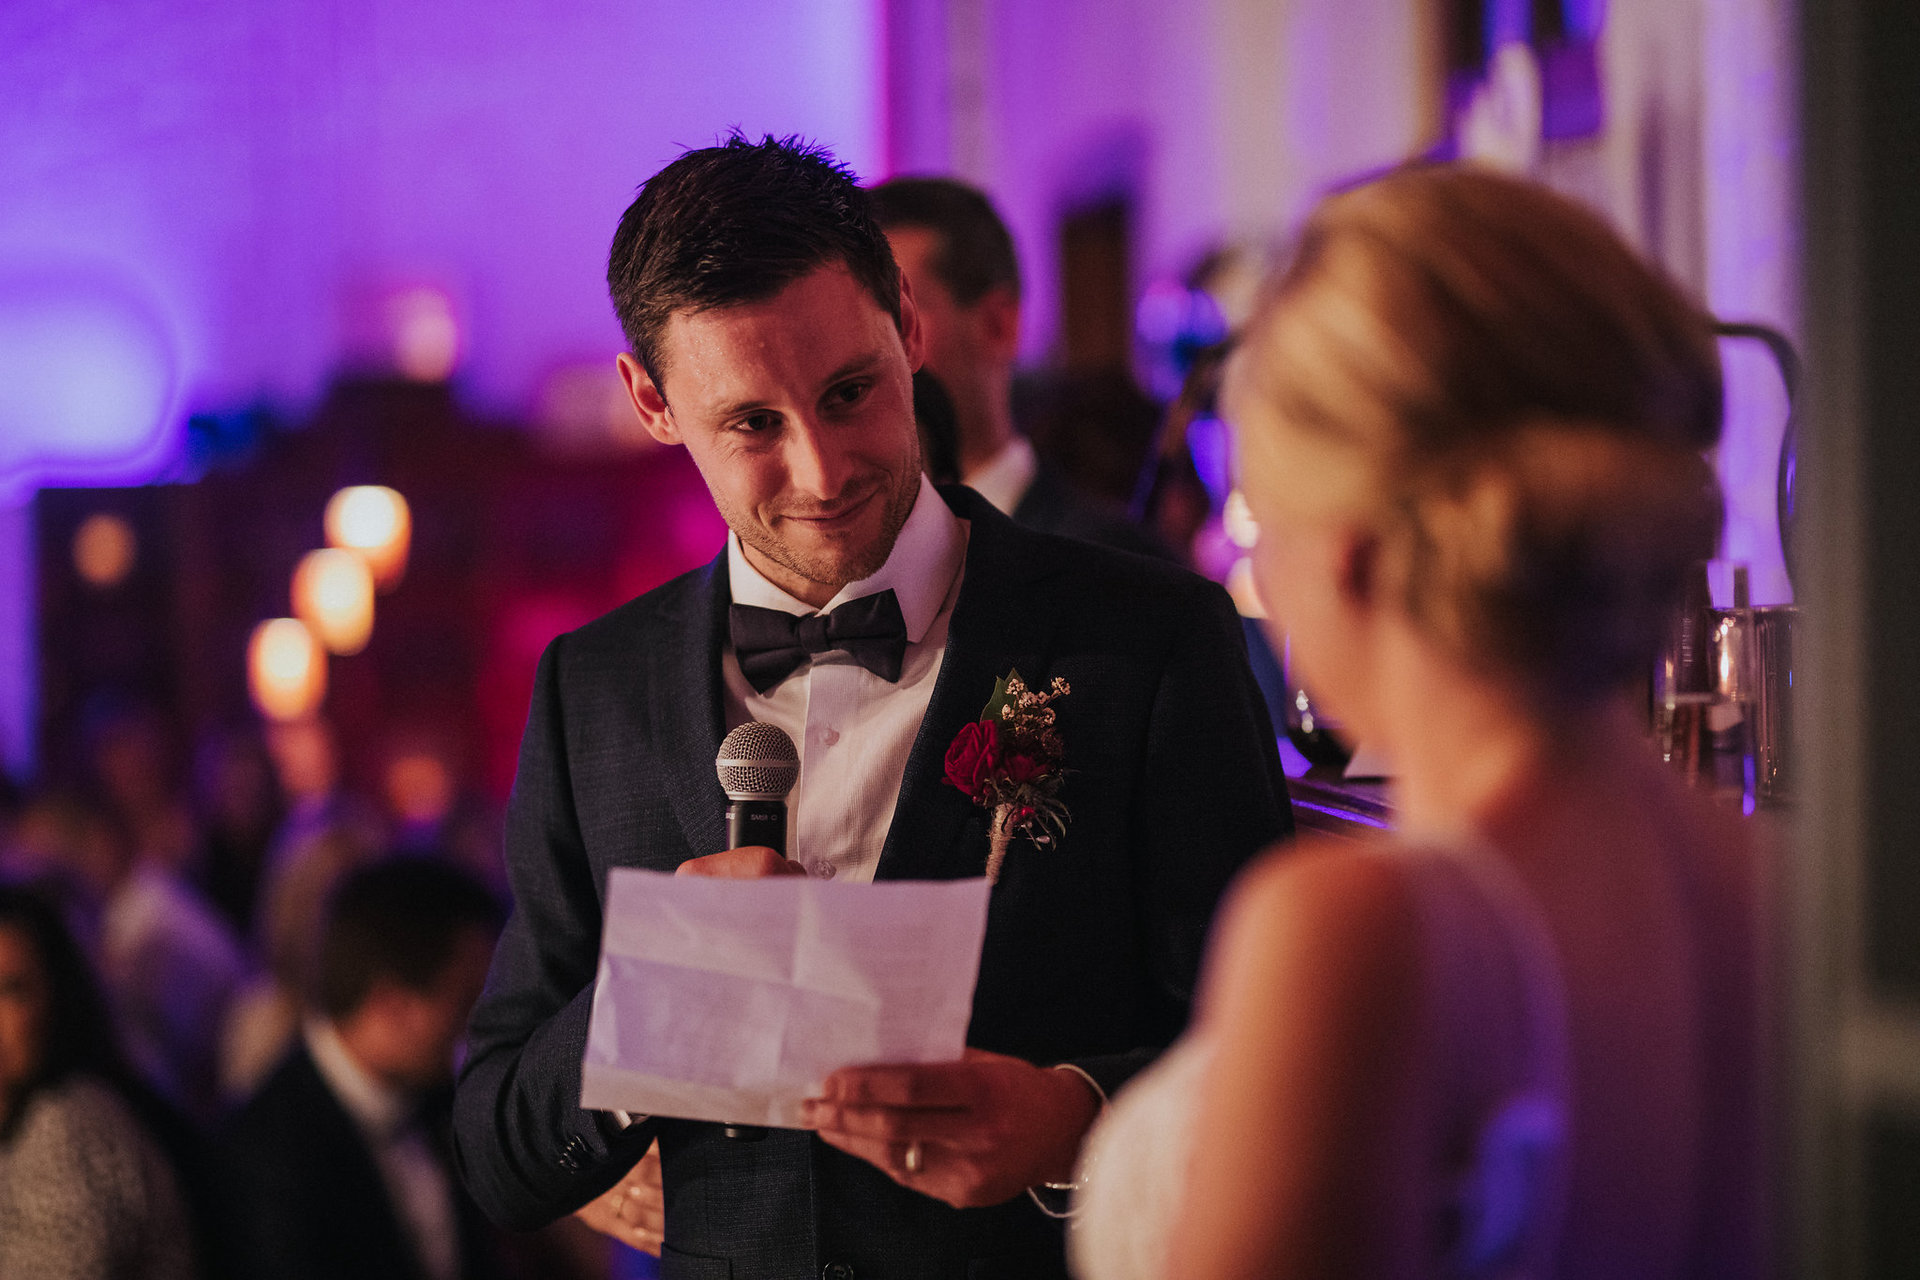 Groom making speech at wedding